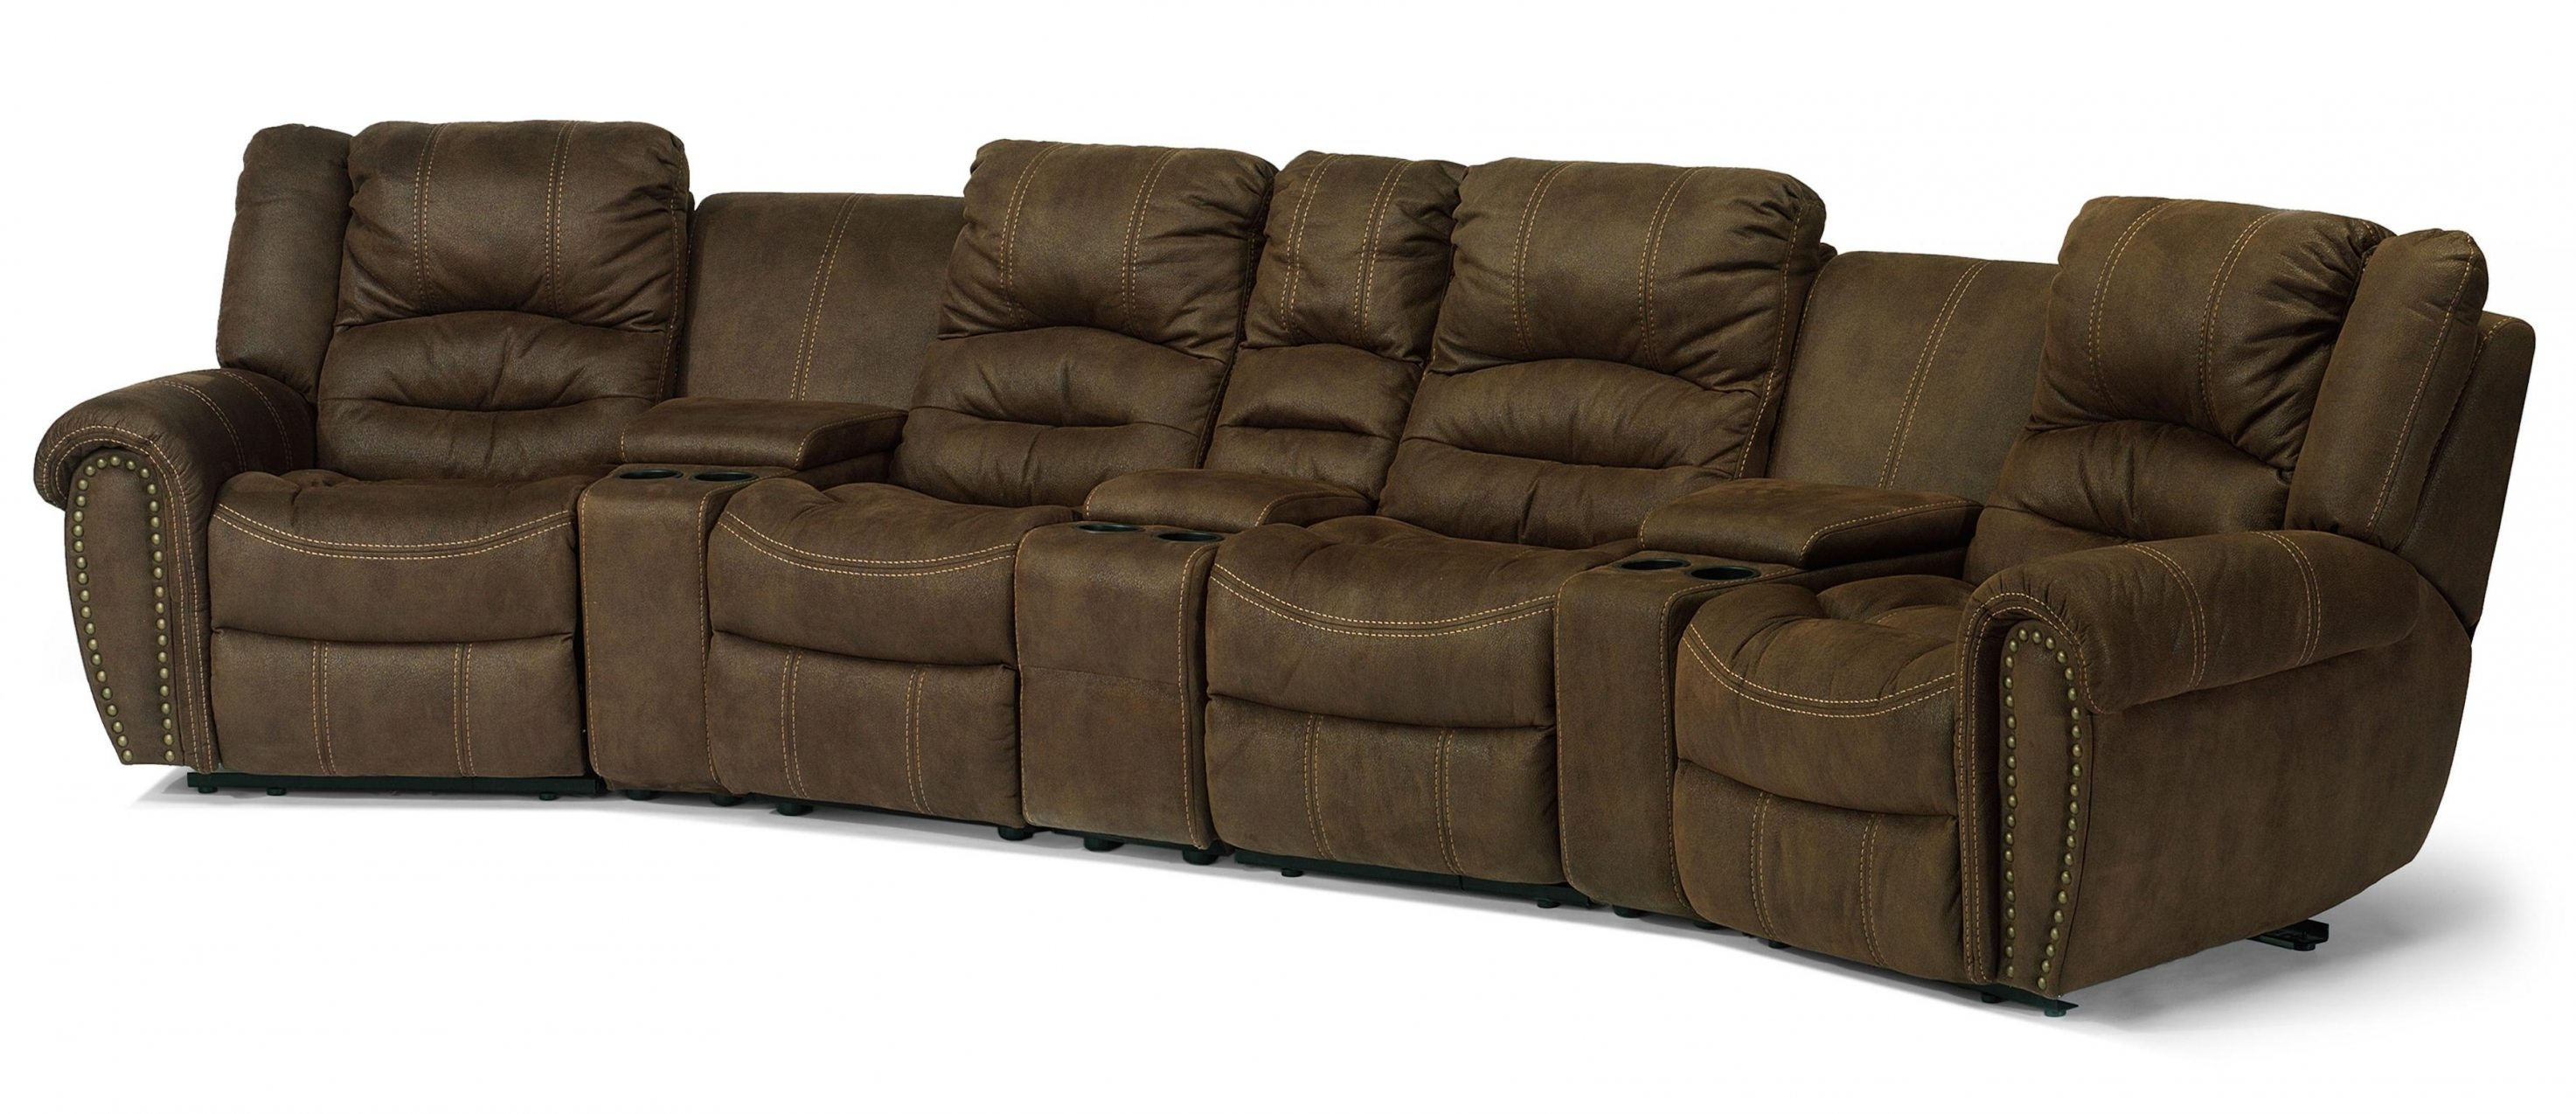 Sofas: Chic Flexsteel Sectional For Living Room Design — Esiobev Intended For Jordans Sectional Sofas (View 6 of 10)